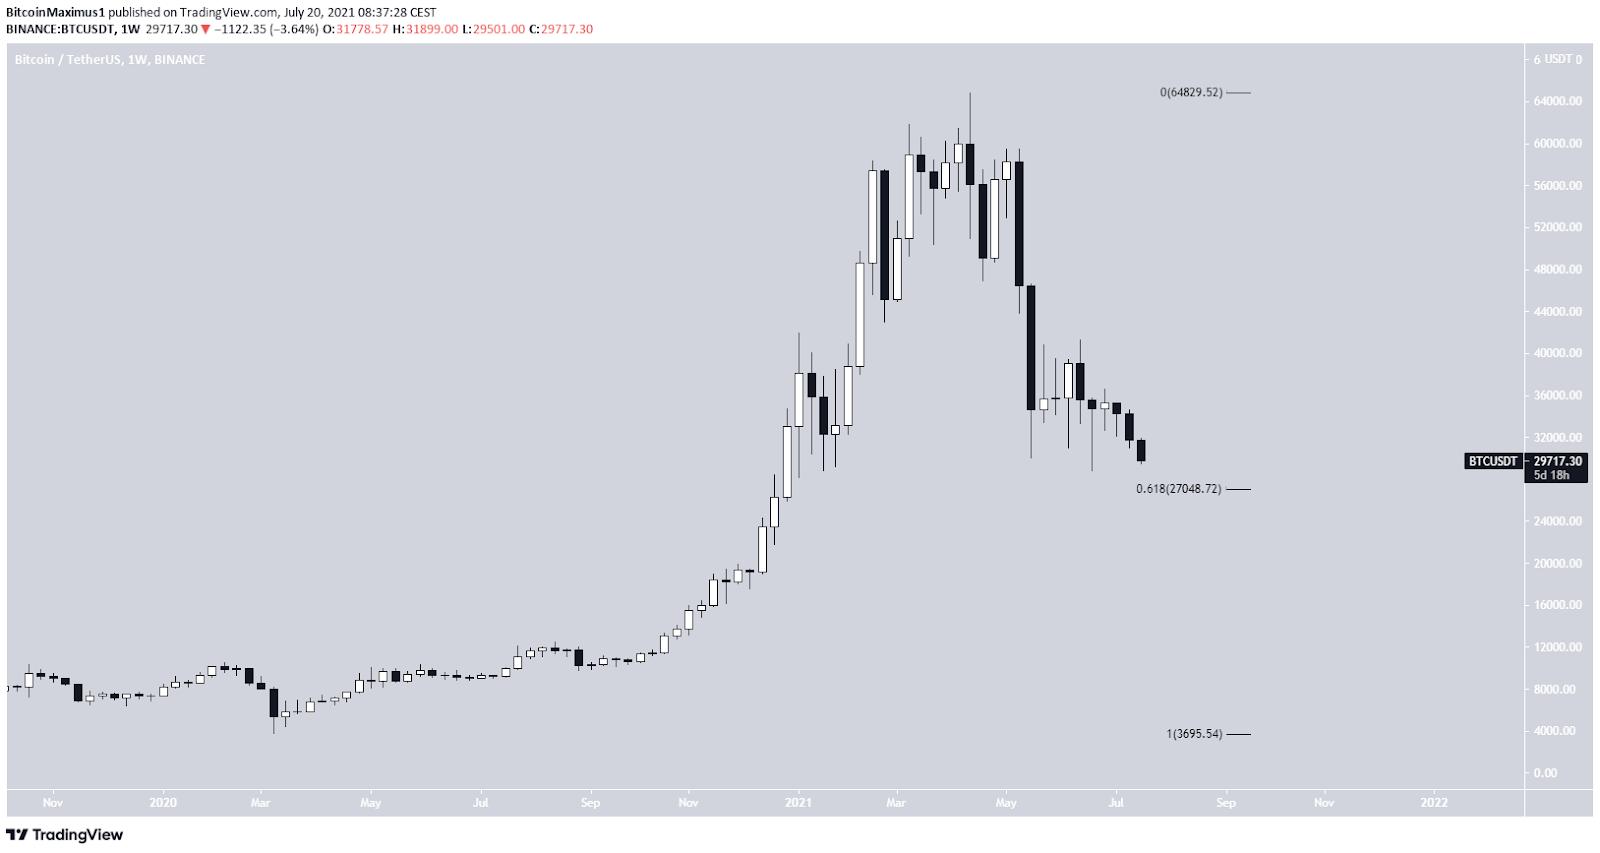 Bitcoin Preis Kurs Wochenchart BTC 20.07.2021